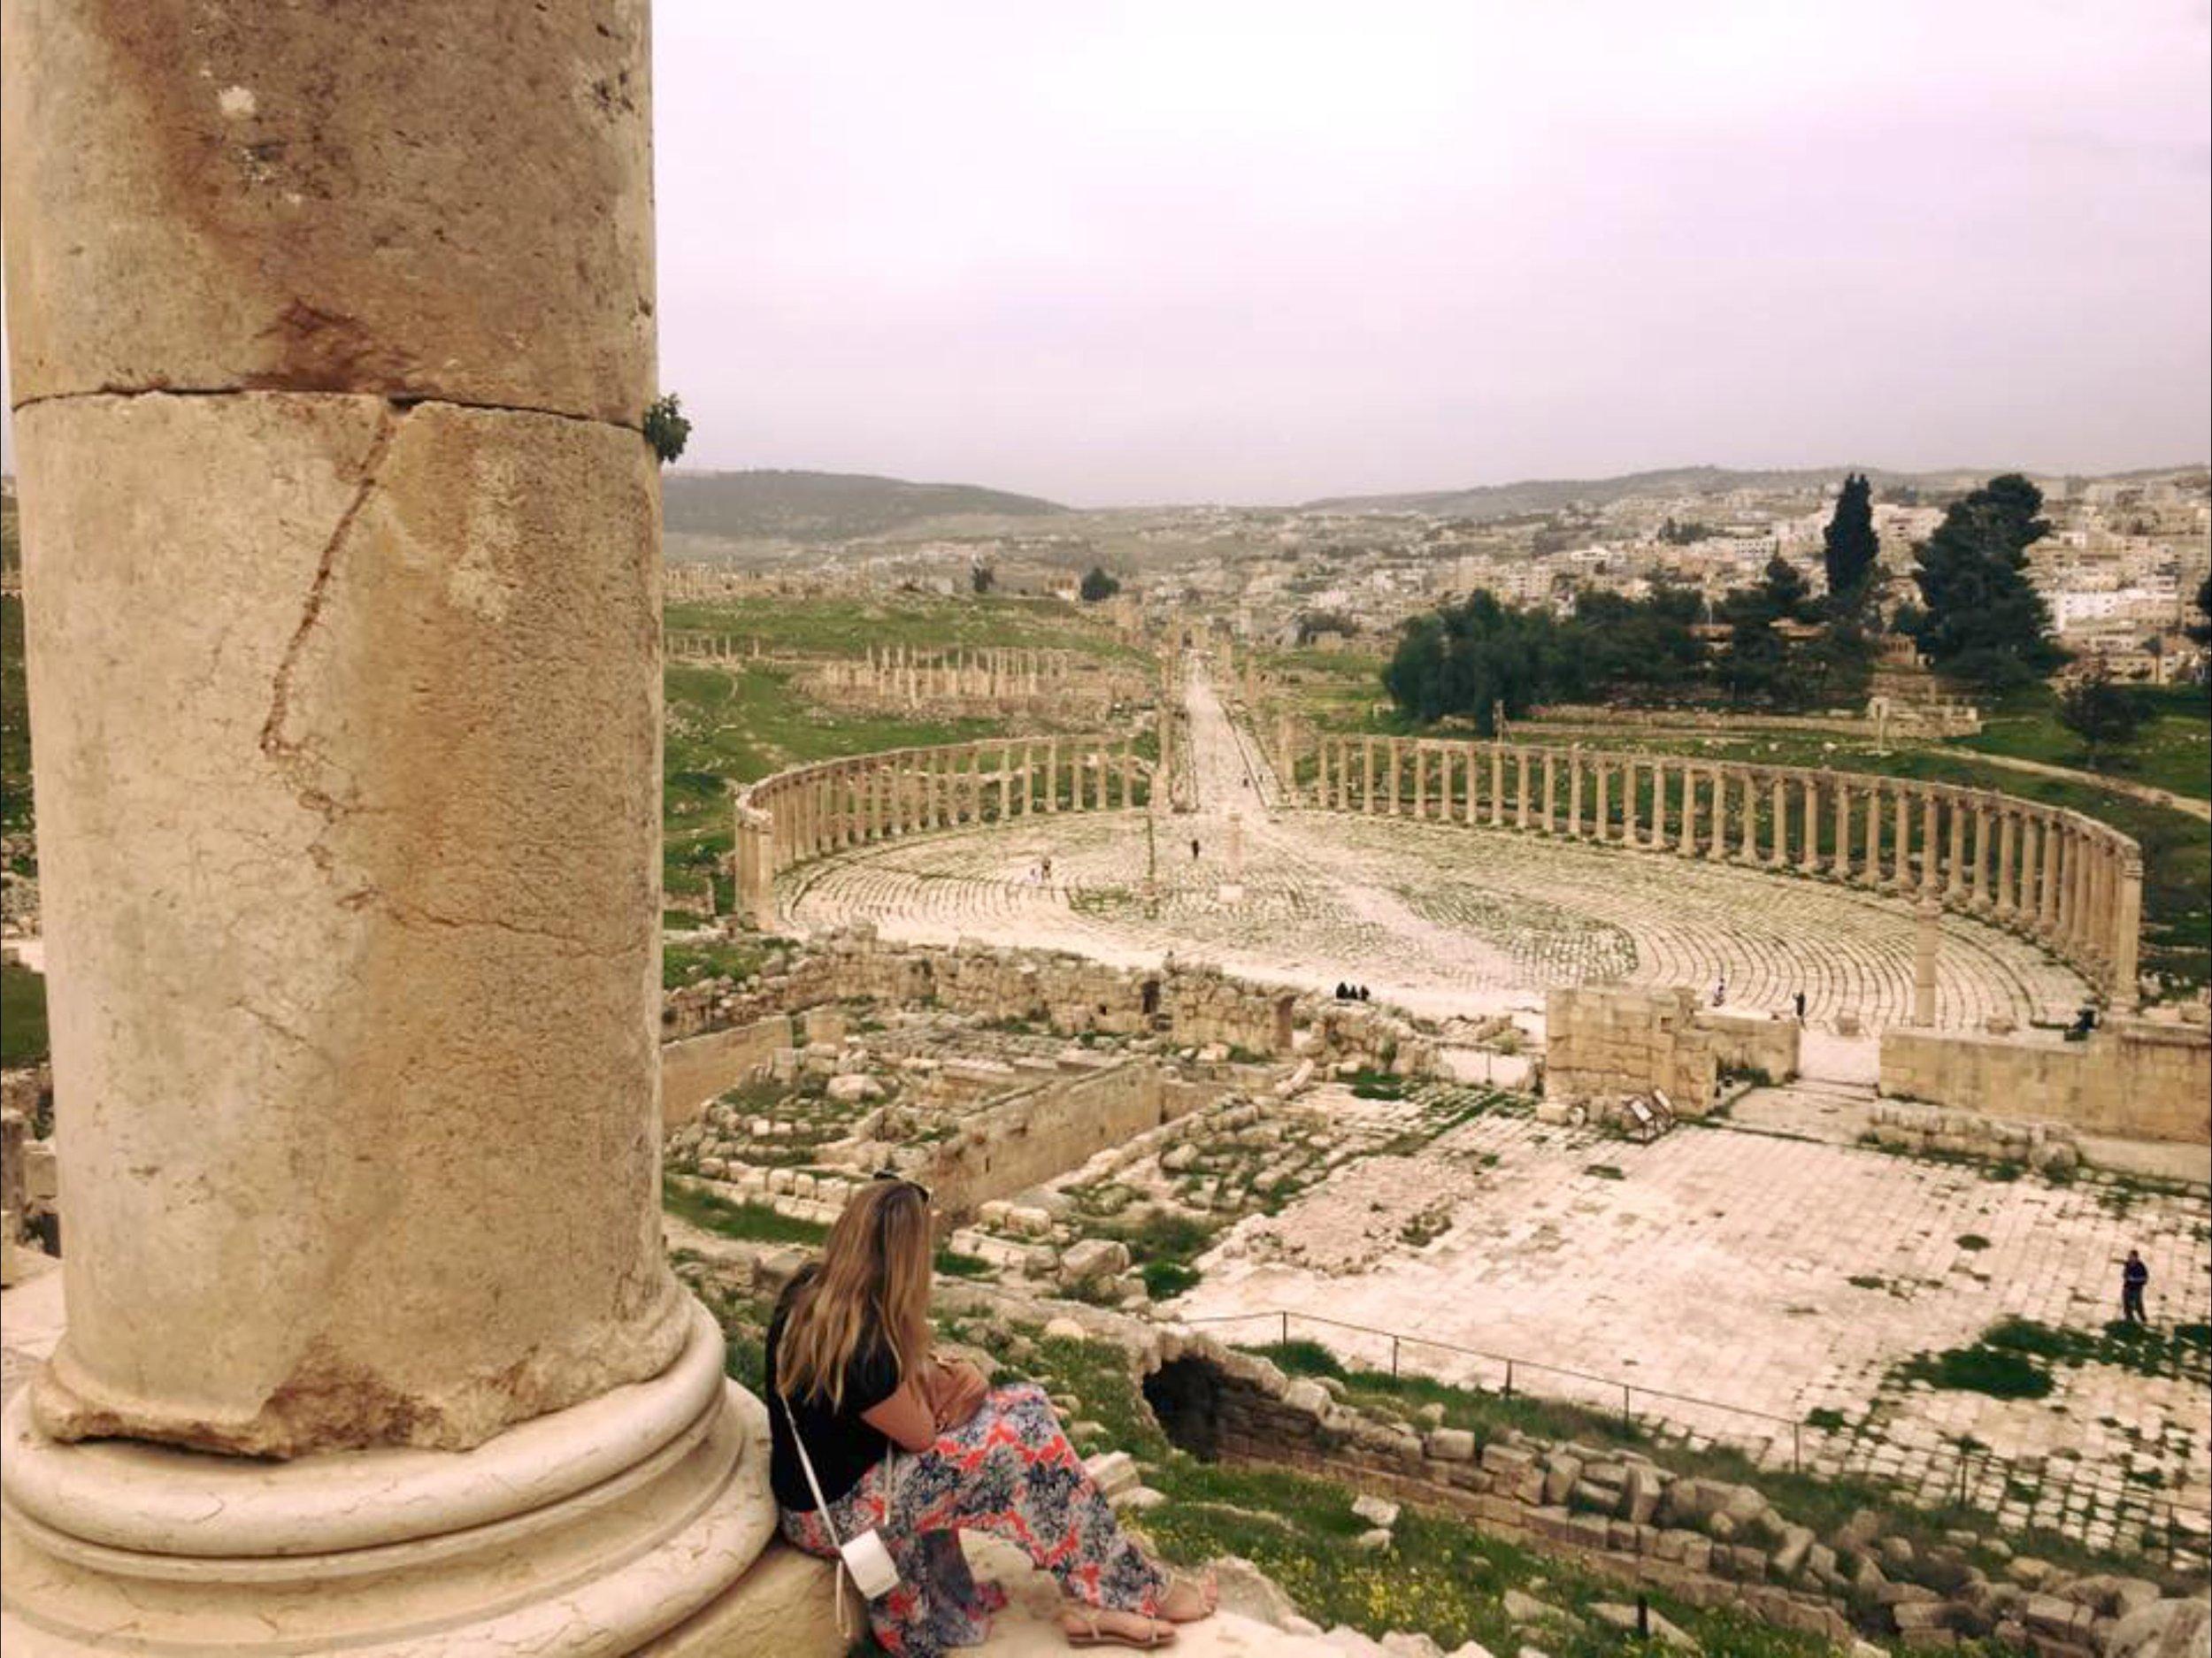 Oval Forum, Jerash